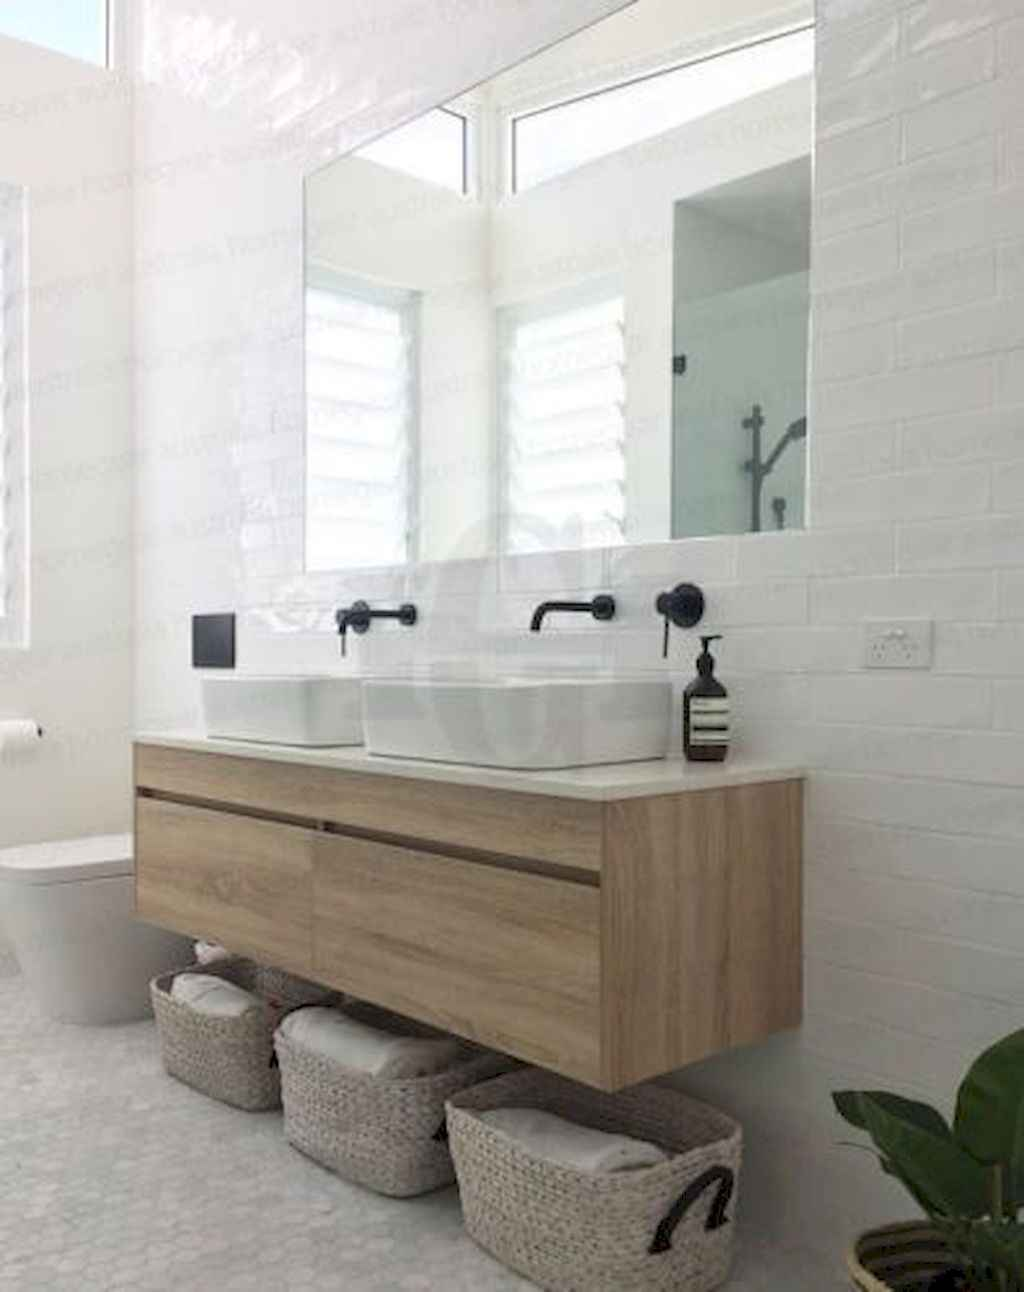 111 Brilliant Small Bathroom Remodel Ideas On A Budget (72)